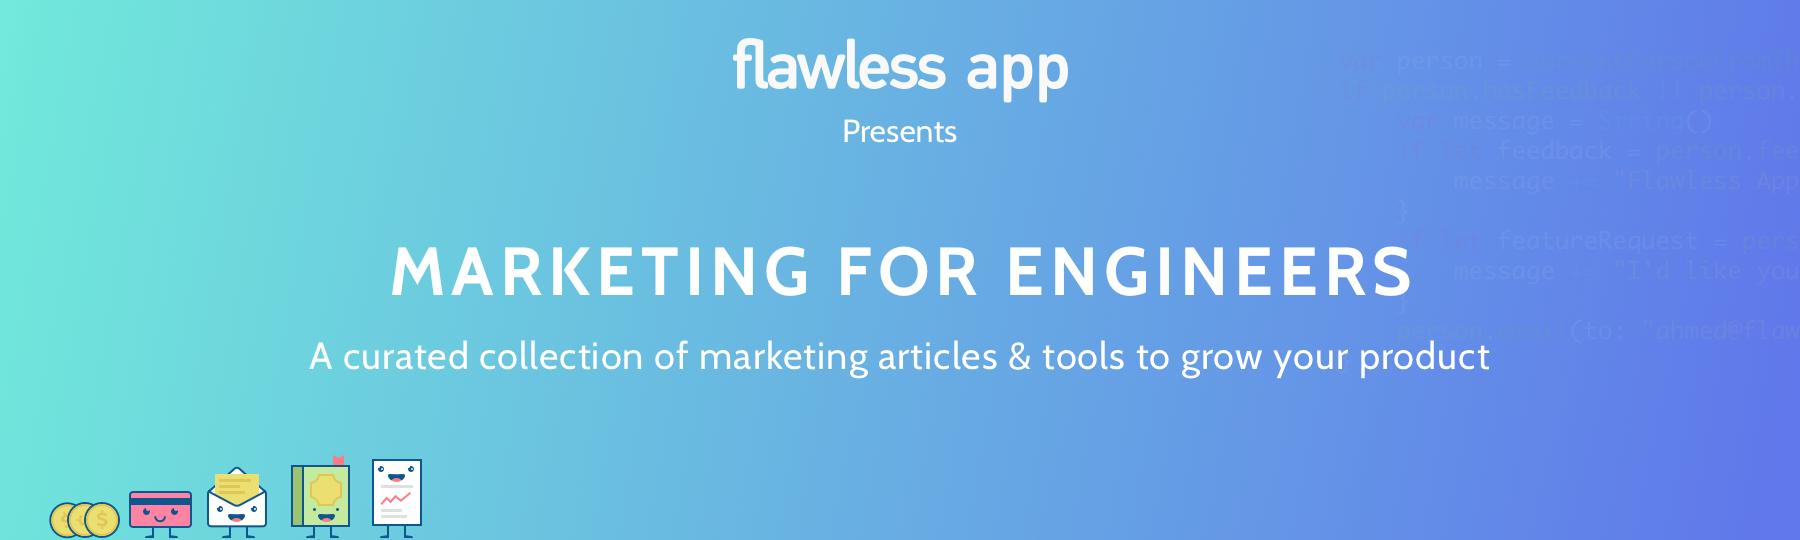 internet marketing Marketing for Engineers